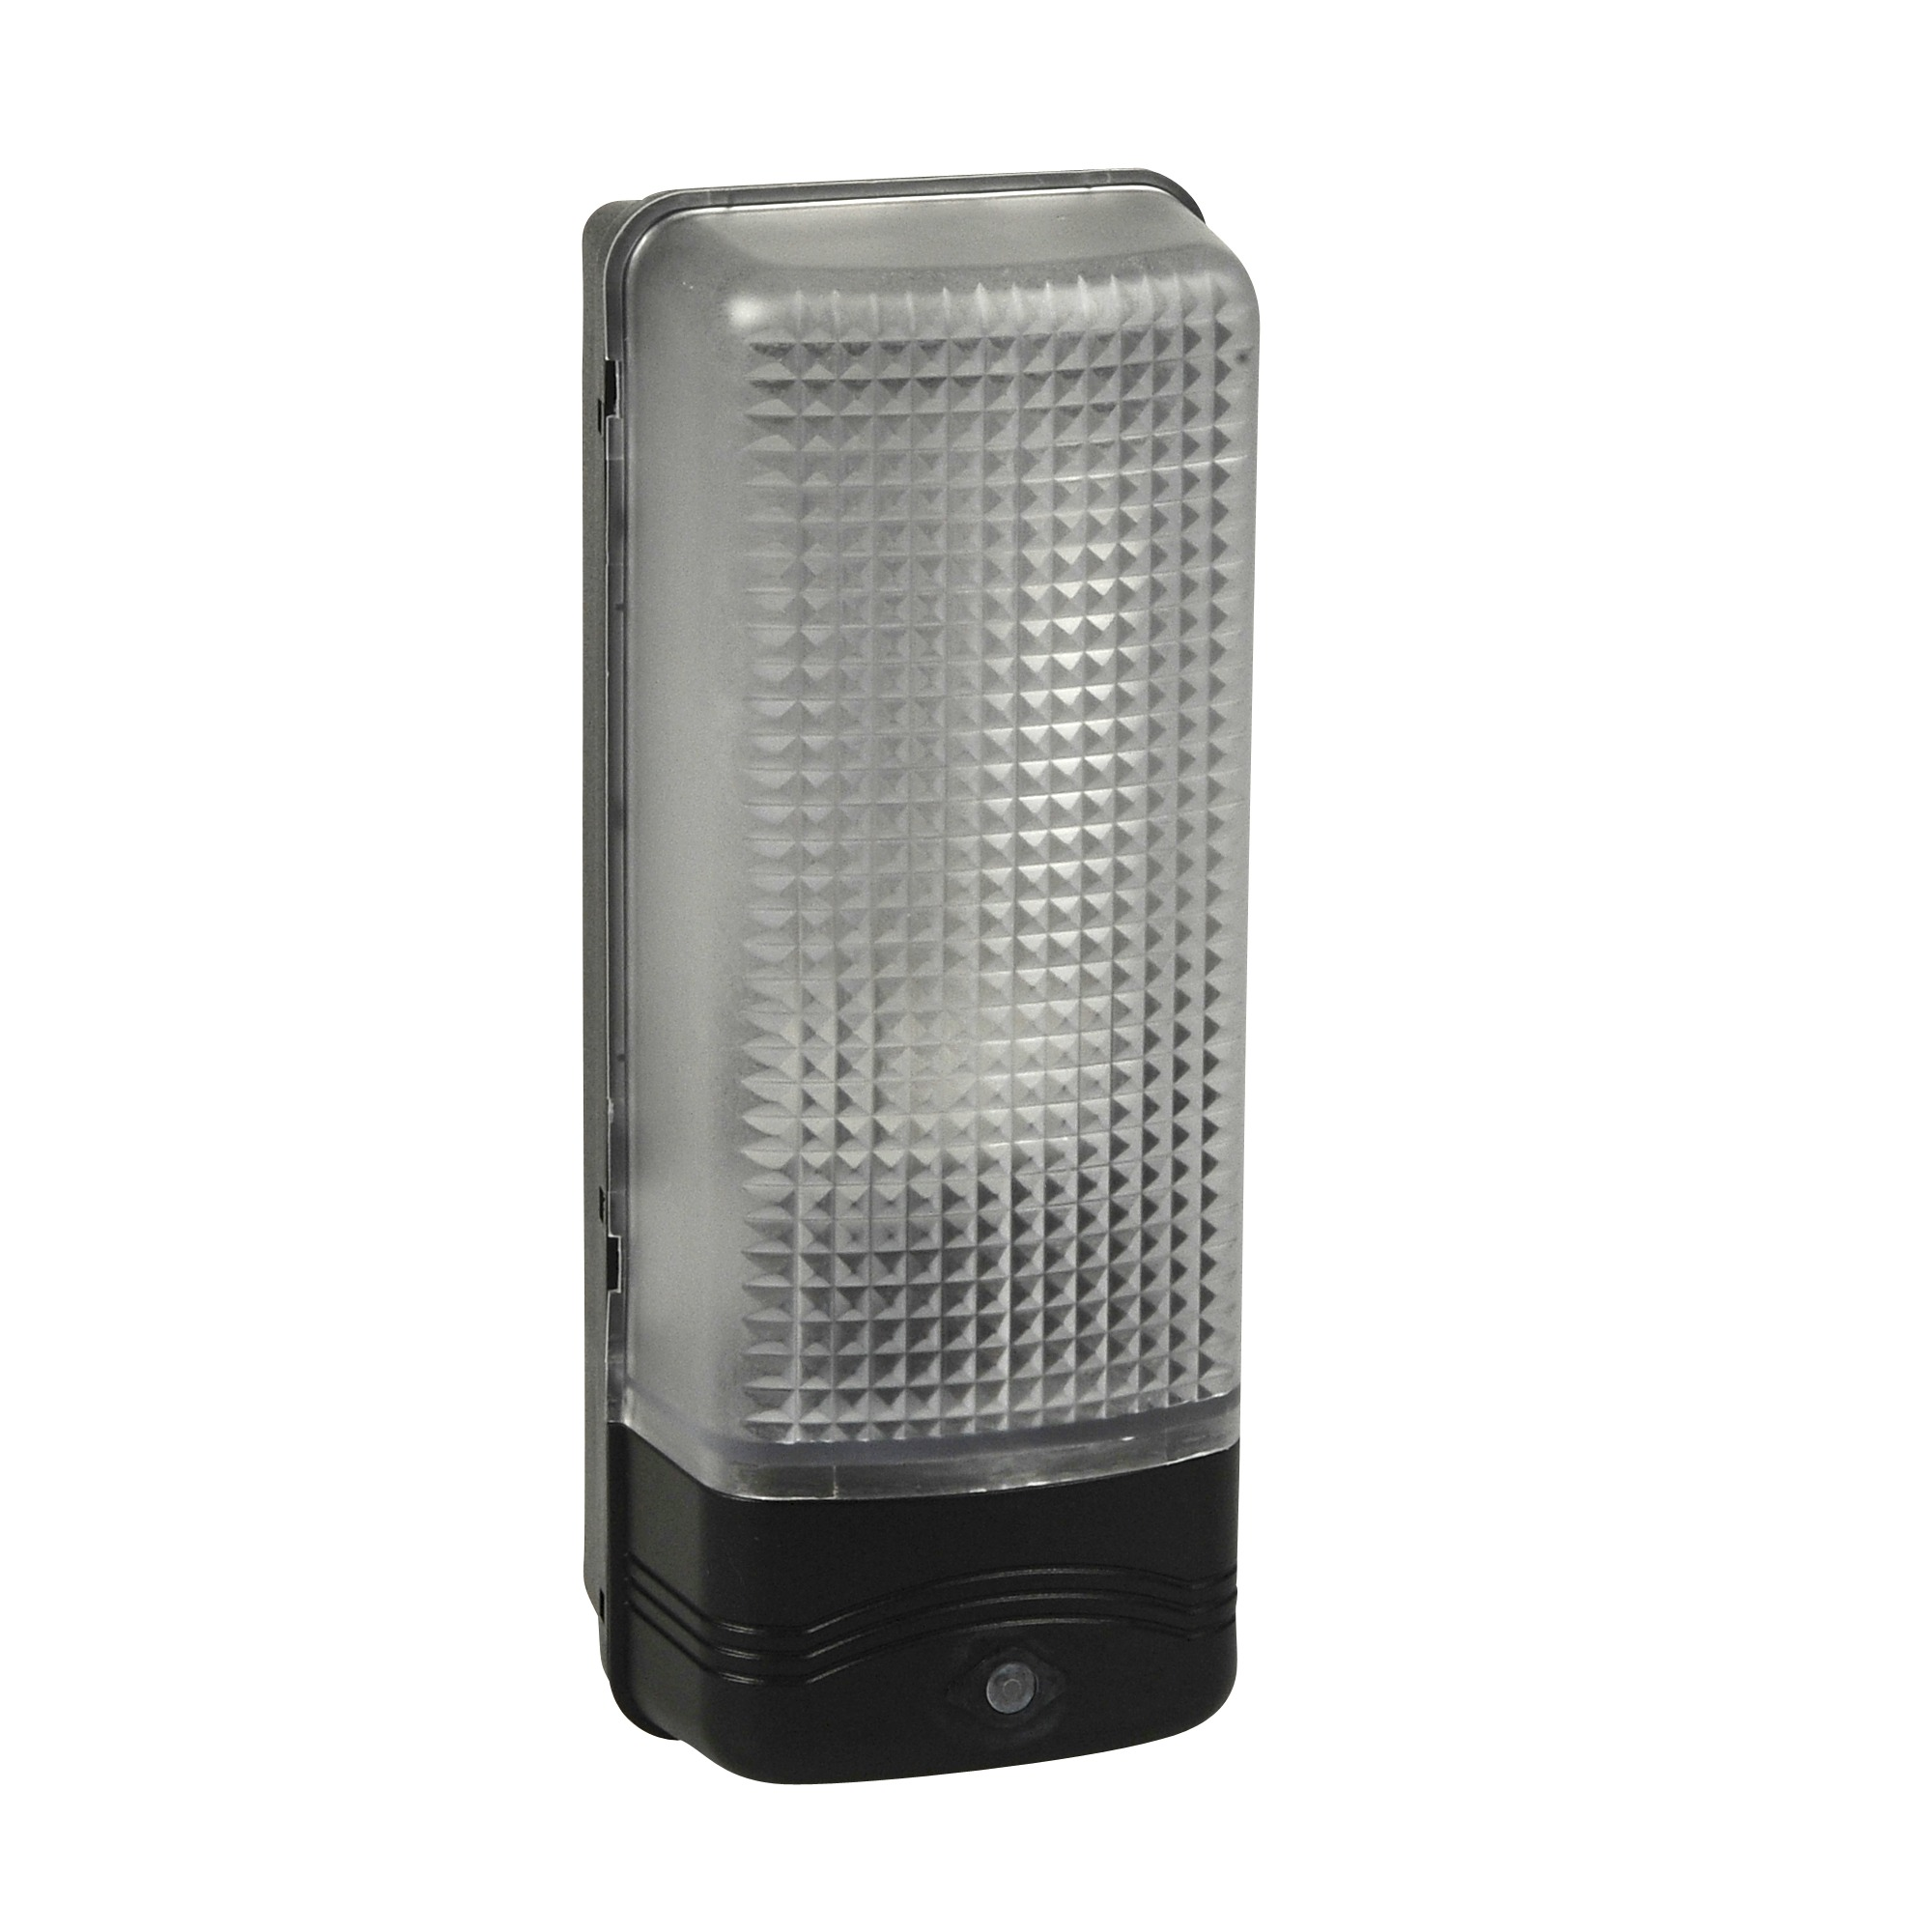 Buitenlamp Met Sensor Praxis.Praxis Wandlamp